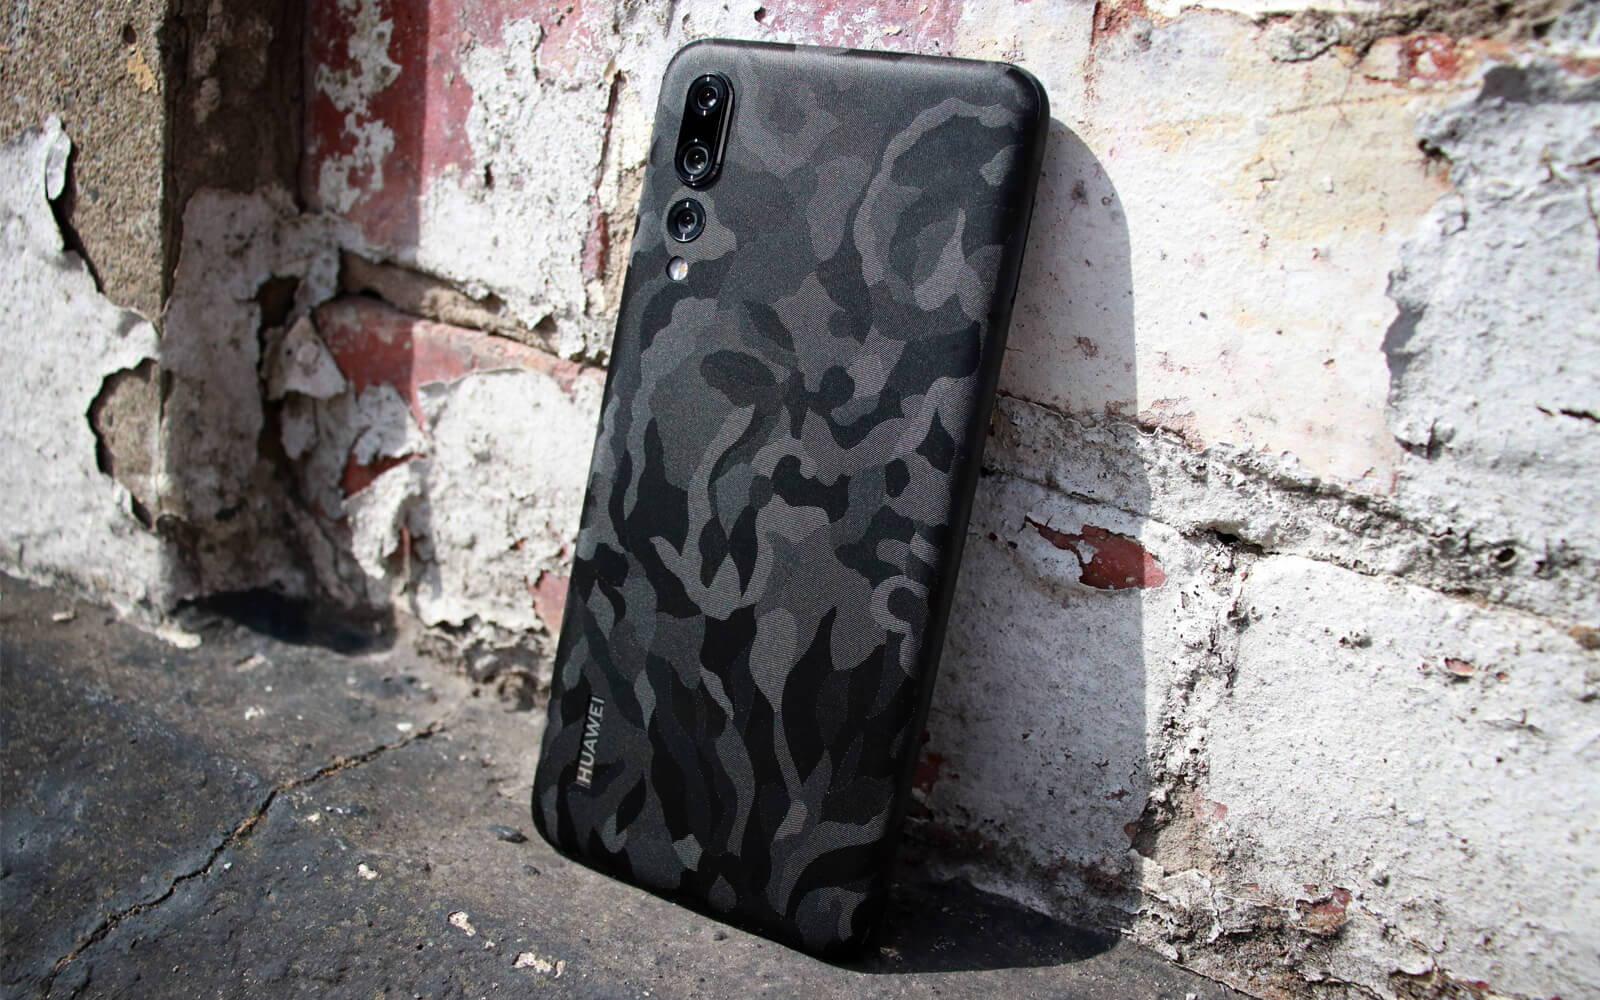 Huawei P20 Pro Black Camo Skins